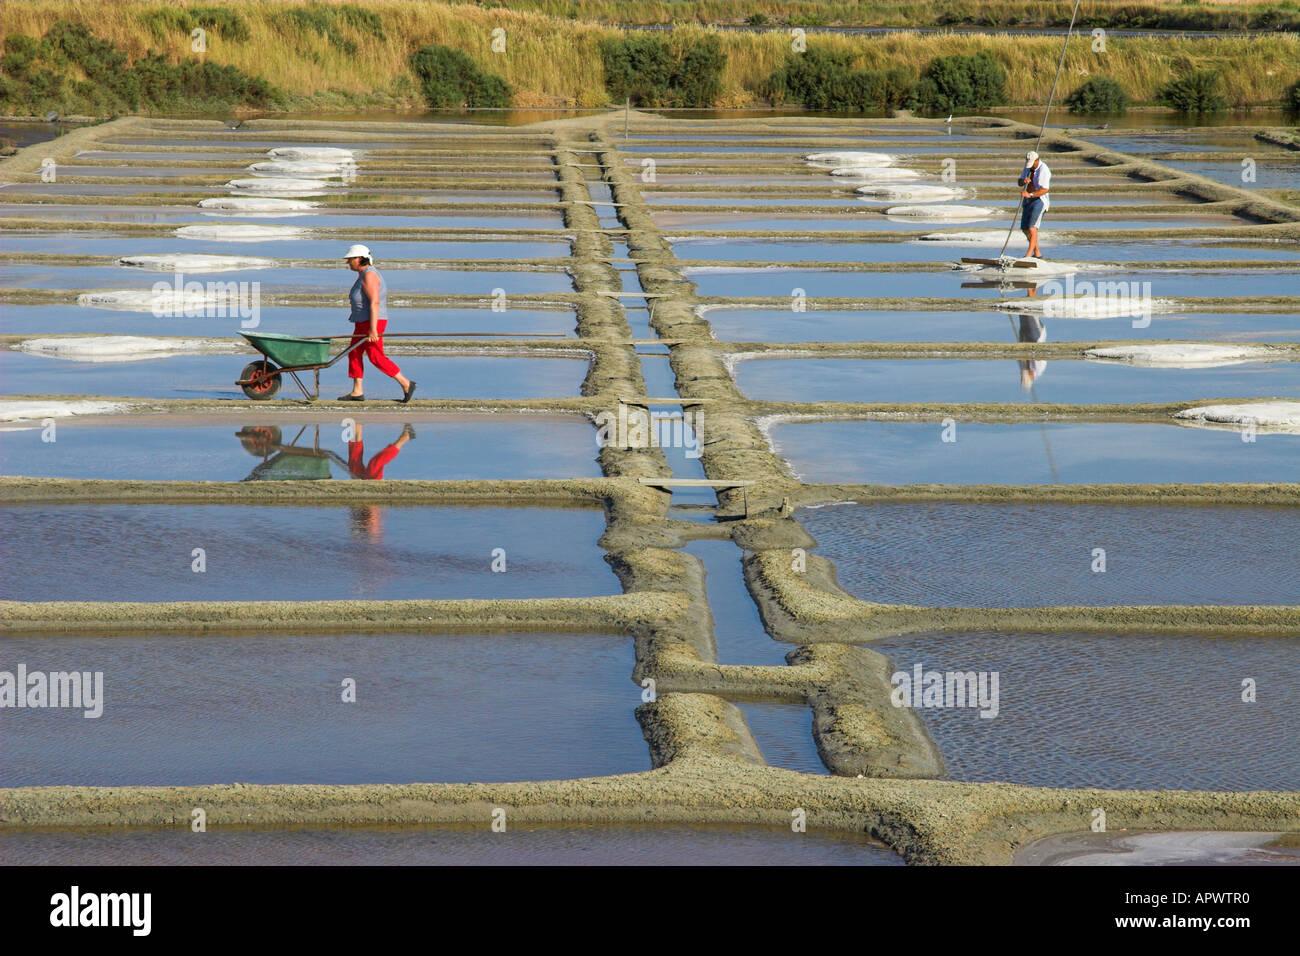 Collecting sea salt in the salt pans (Marais Salants de Guérande), Brittany, France Stock Photo